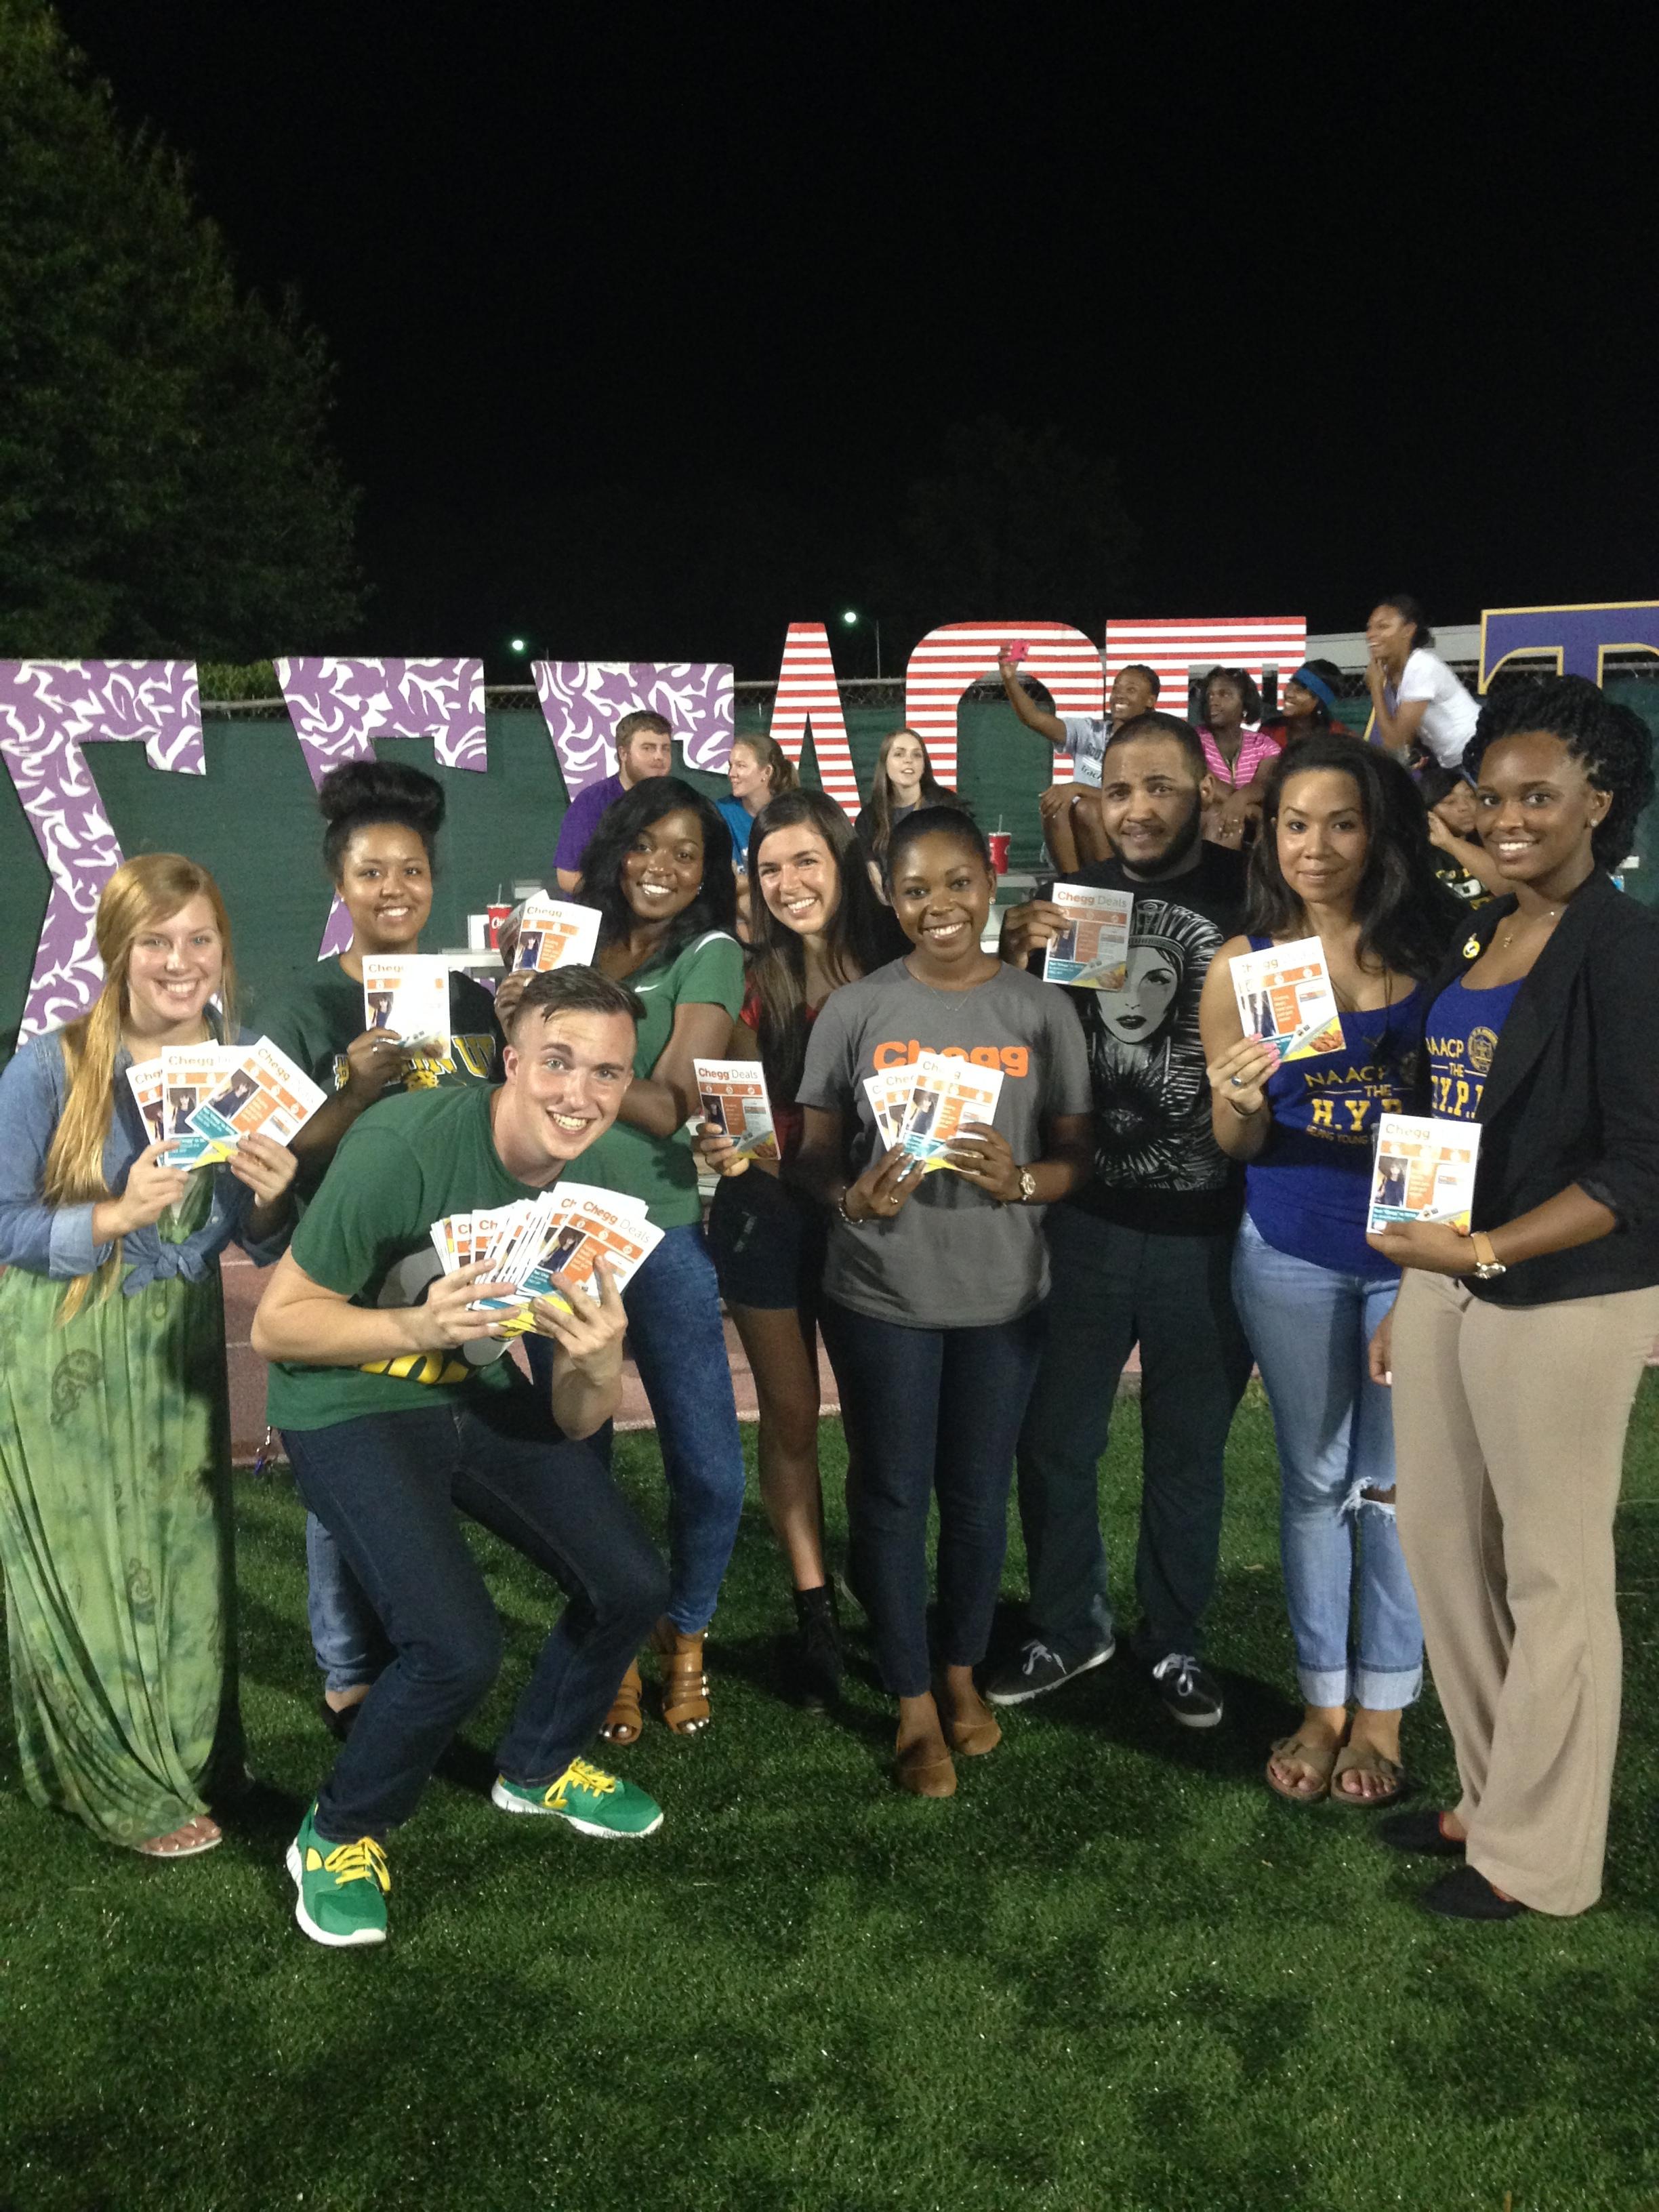 SLU Event Marketing Team for the 2014 Launch of Chegg Deals